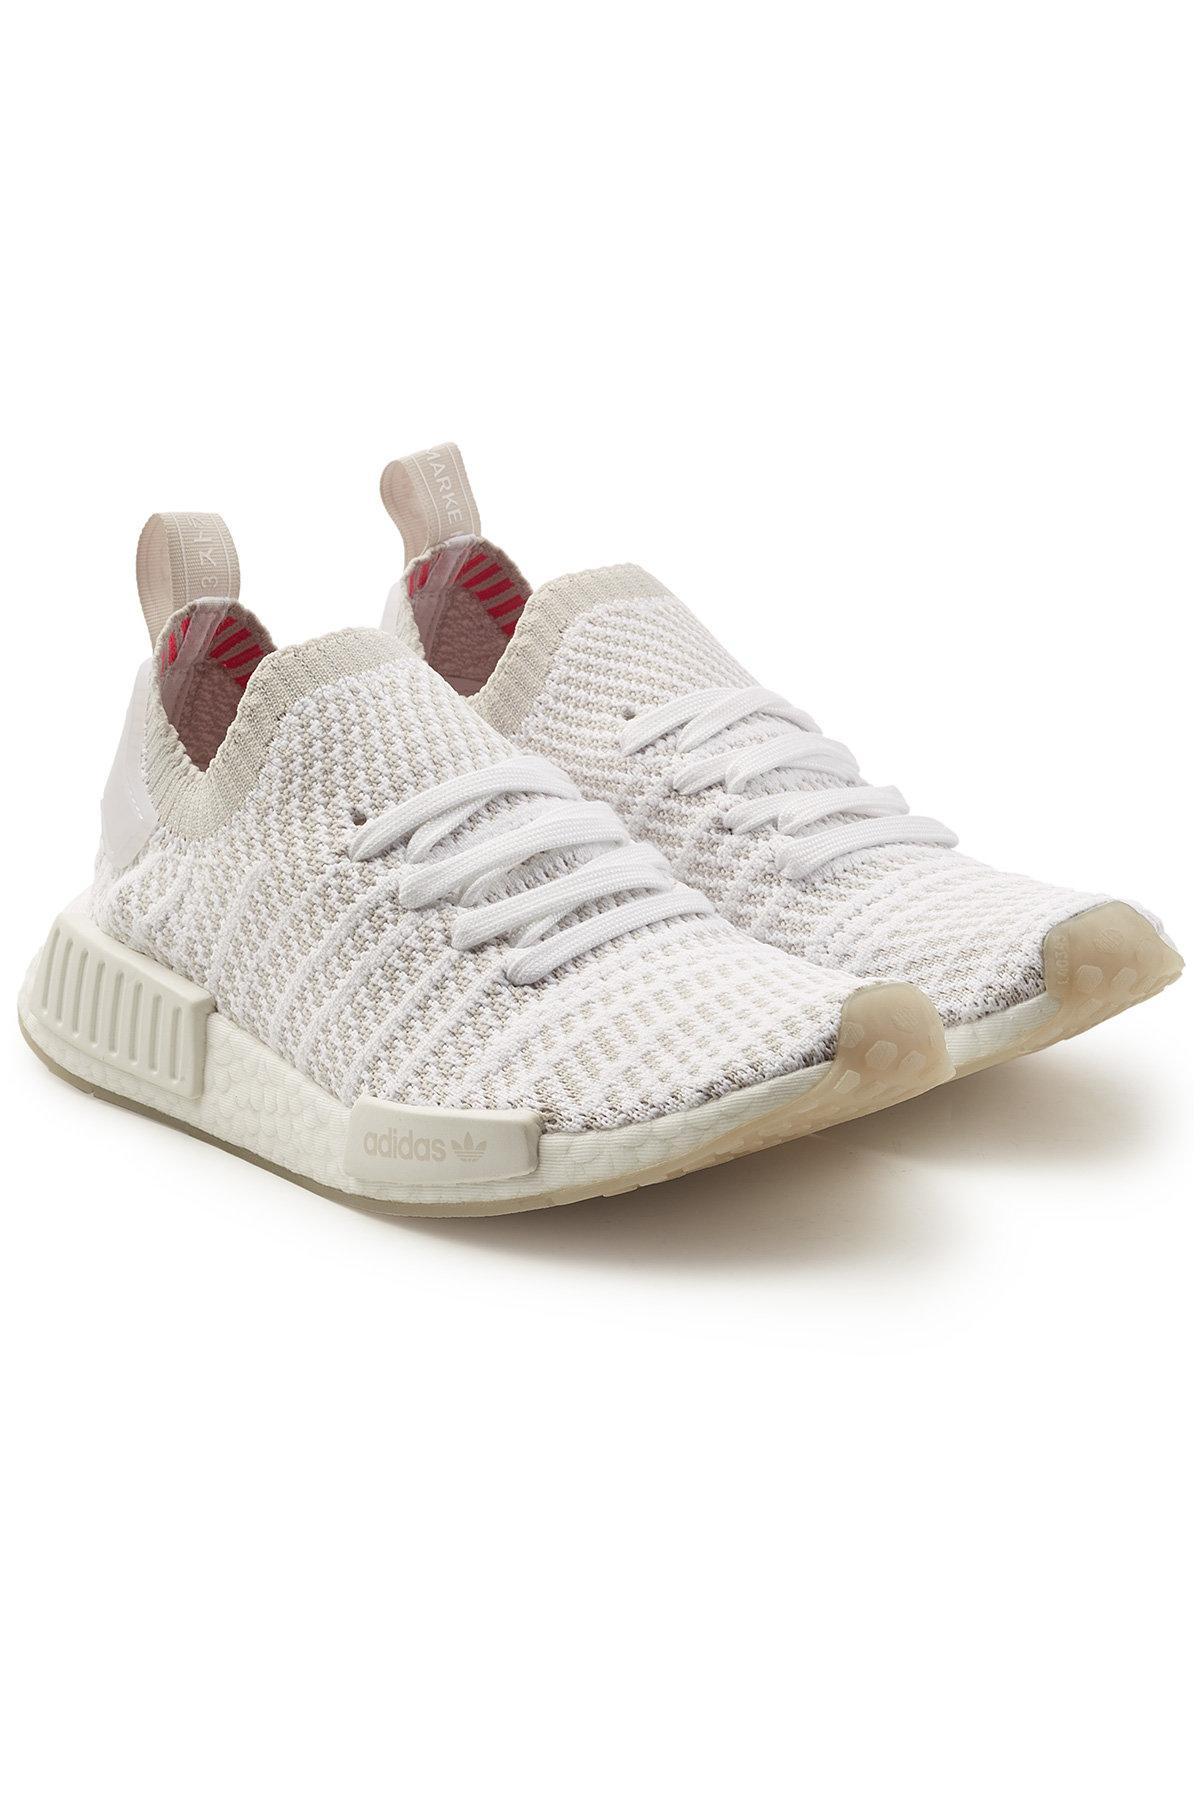 adidas Originals Nmd R1 Stlt Primeknit Sneakers in White Lyst